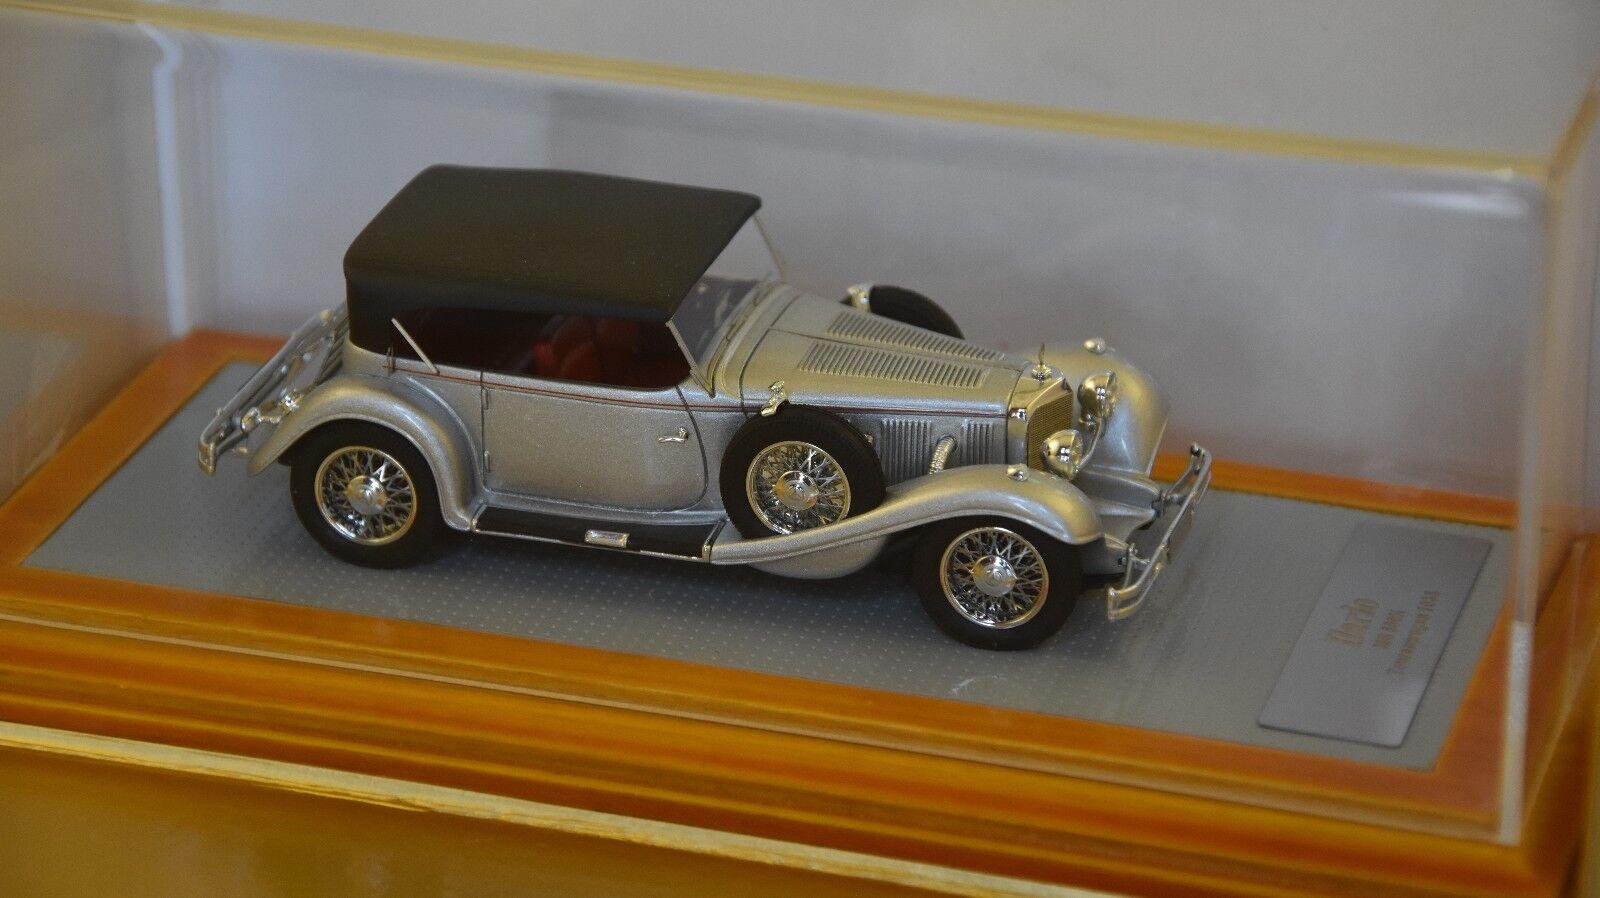 ILARIO - - - Mercedes Benz 500K Tourenwagen 1936 sn113696 argent 1936 1 43 f045f2